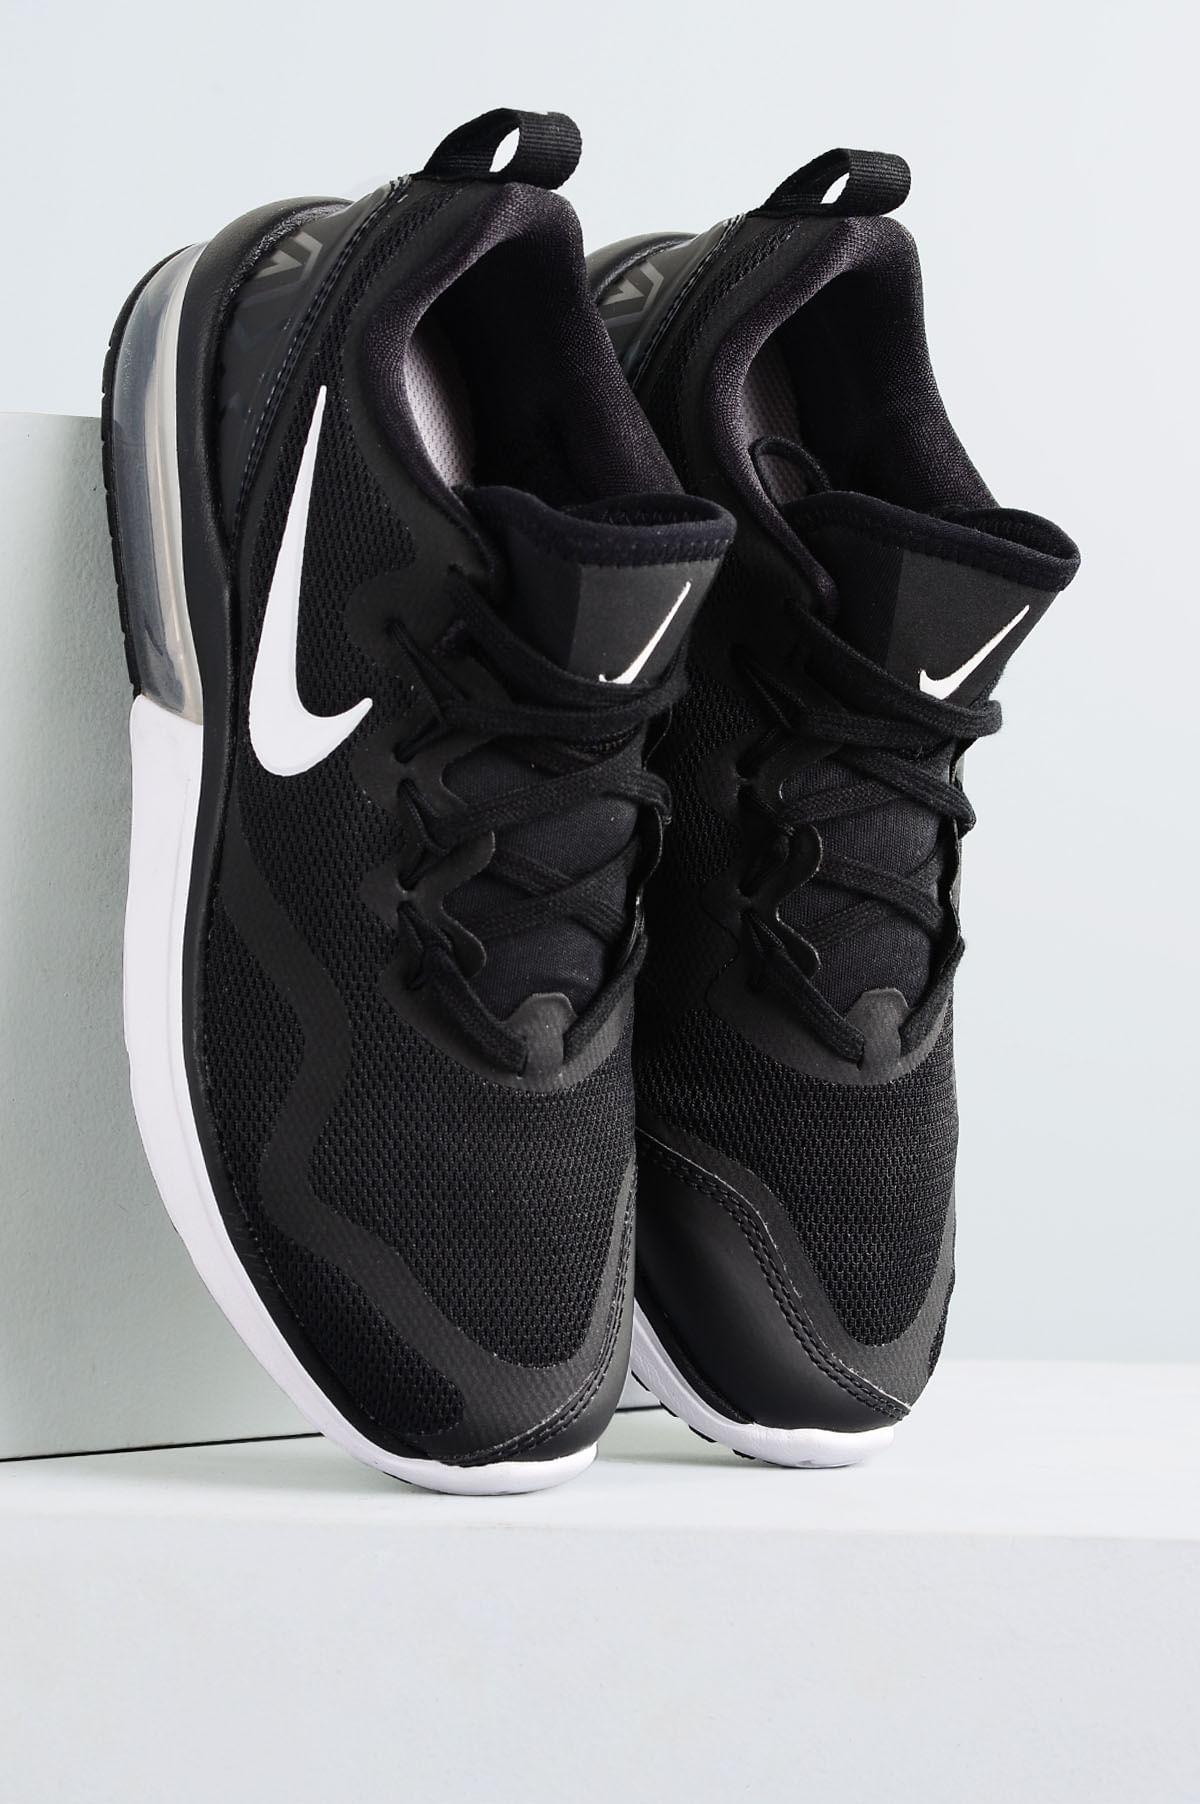 3442d349712ad Tênis Feminino Nike Air Max Fury TEC - PRETO - Mundial Calçados